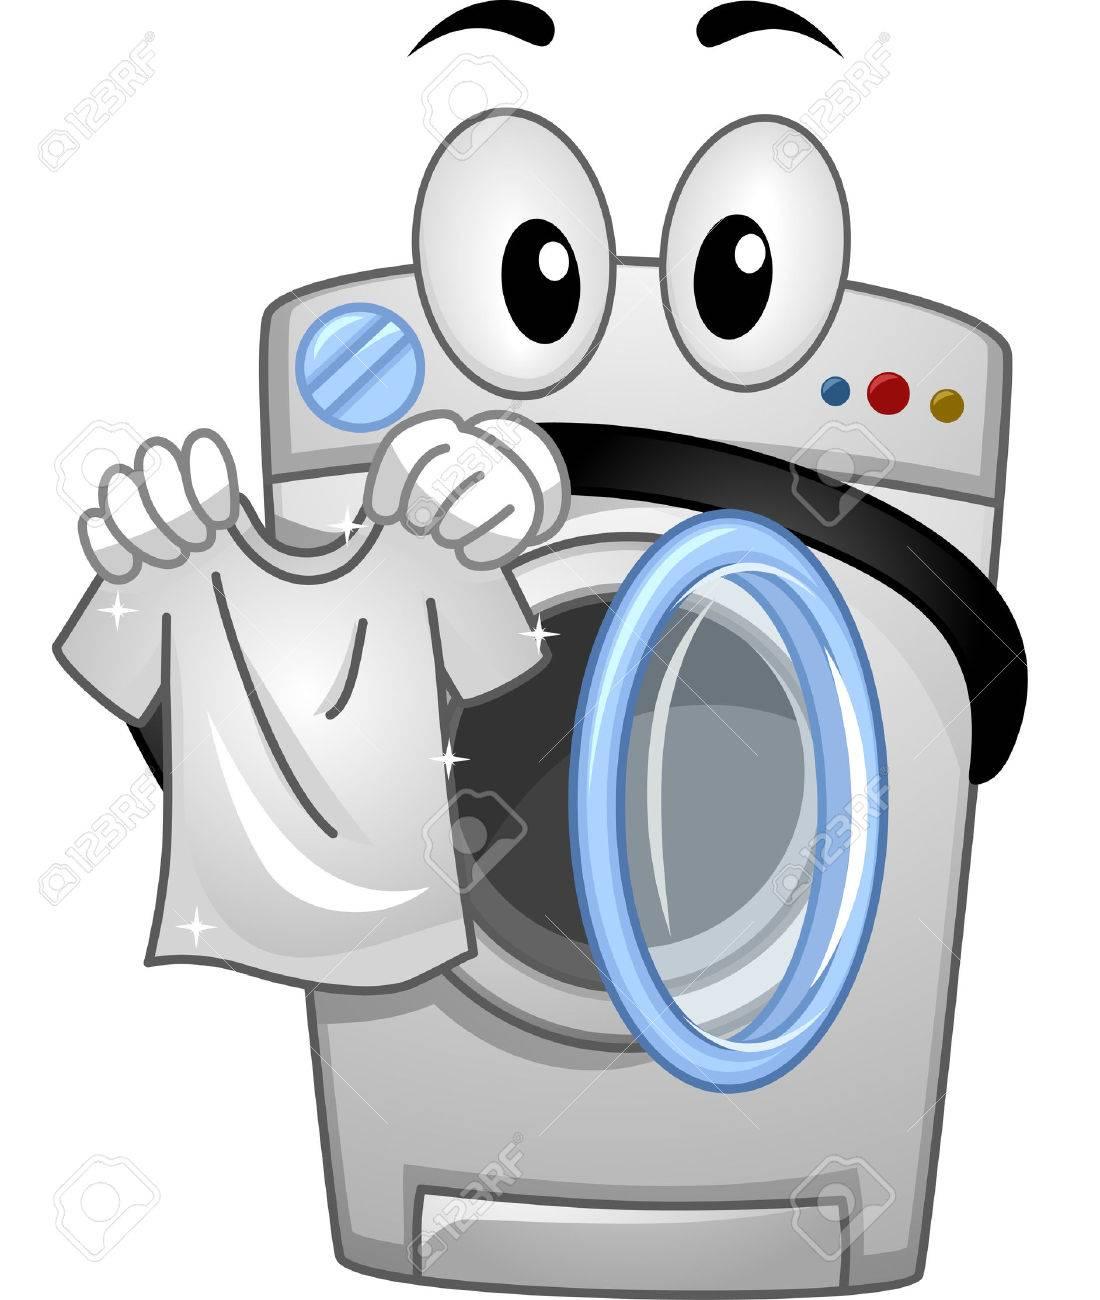 Mascot Illustration of a Washing Machine Handling a White Clean Shirt - 54948826